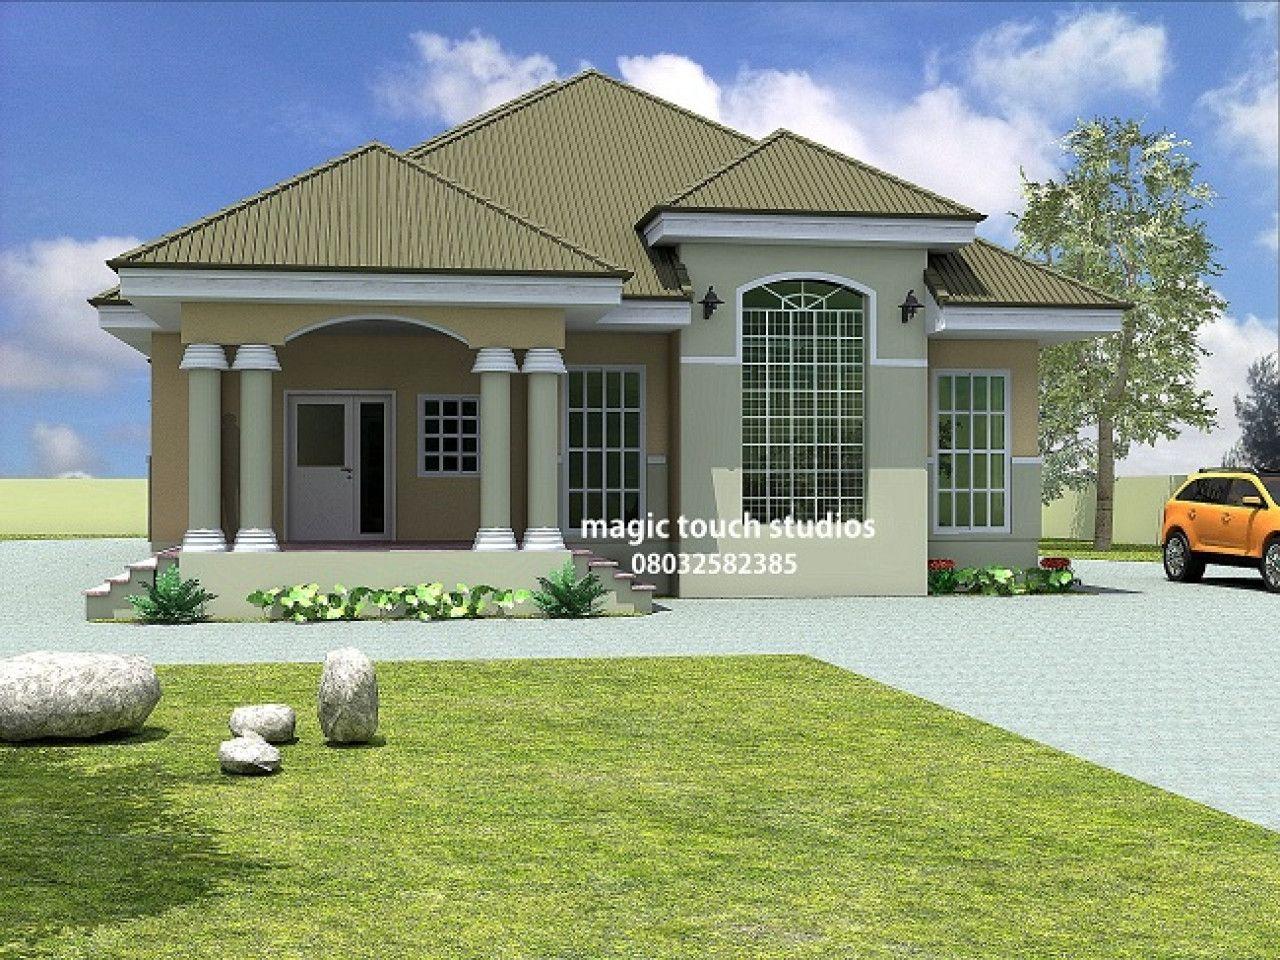 Illustrate Home Designs Kenya 5 Bedroom Bungalow 5 Bedroom Bungalow House Plan In Bungalow House Plans Home Design Floor Plans Affordable House Plans